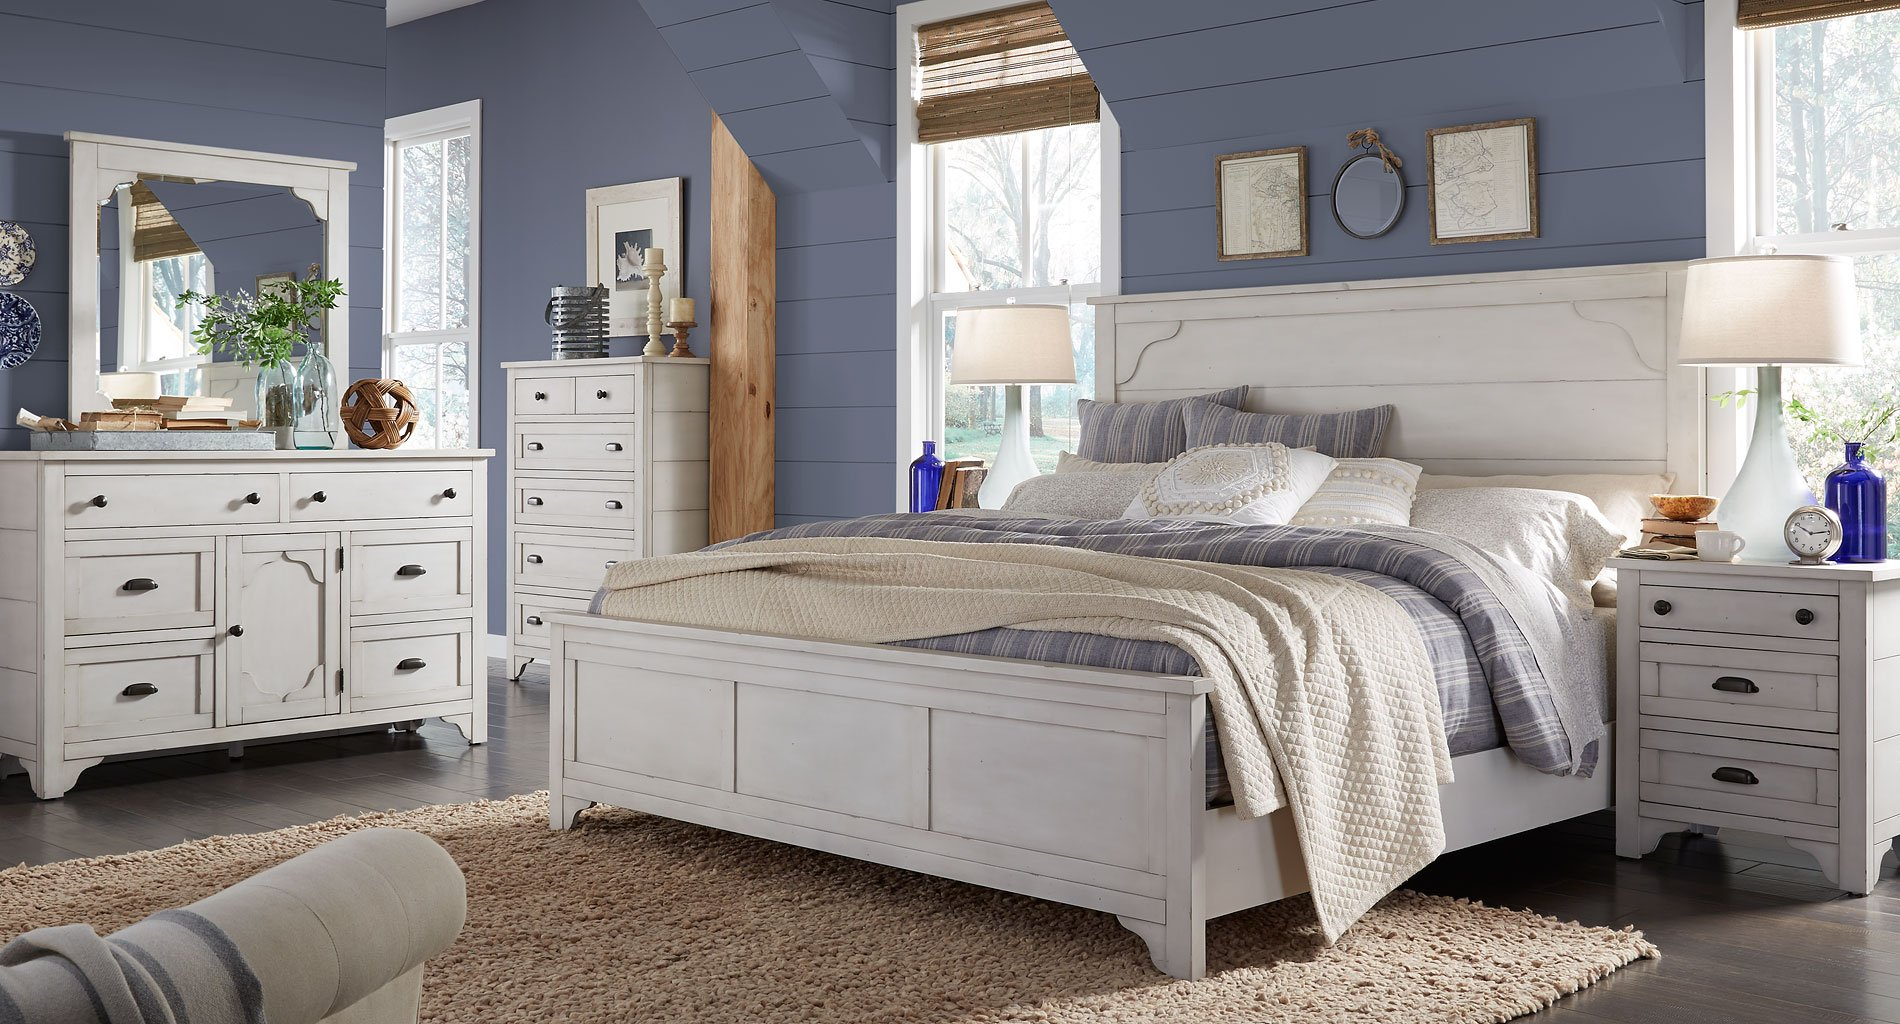 Coventry Lane Panel Bedroom Set by Magnussen  FurniturePick